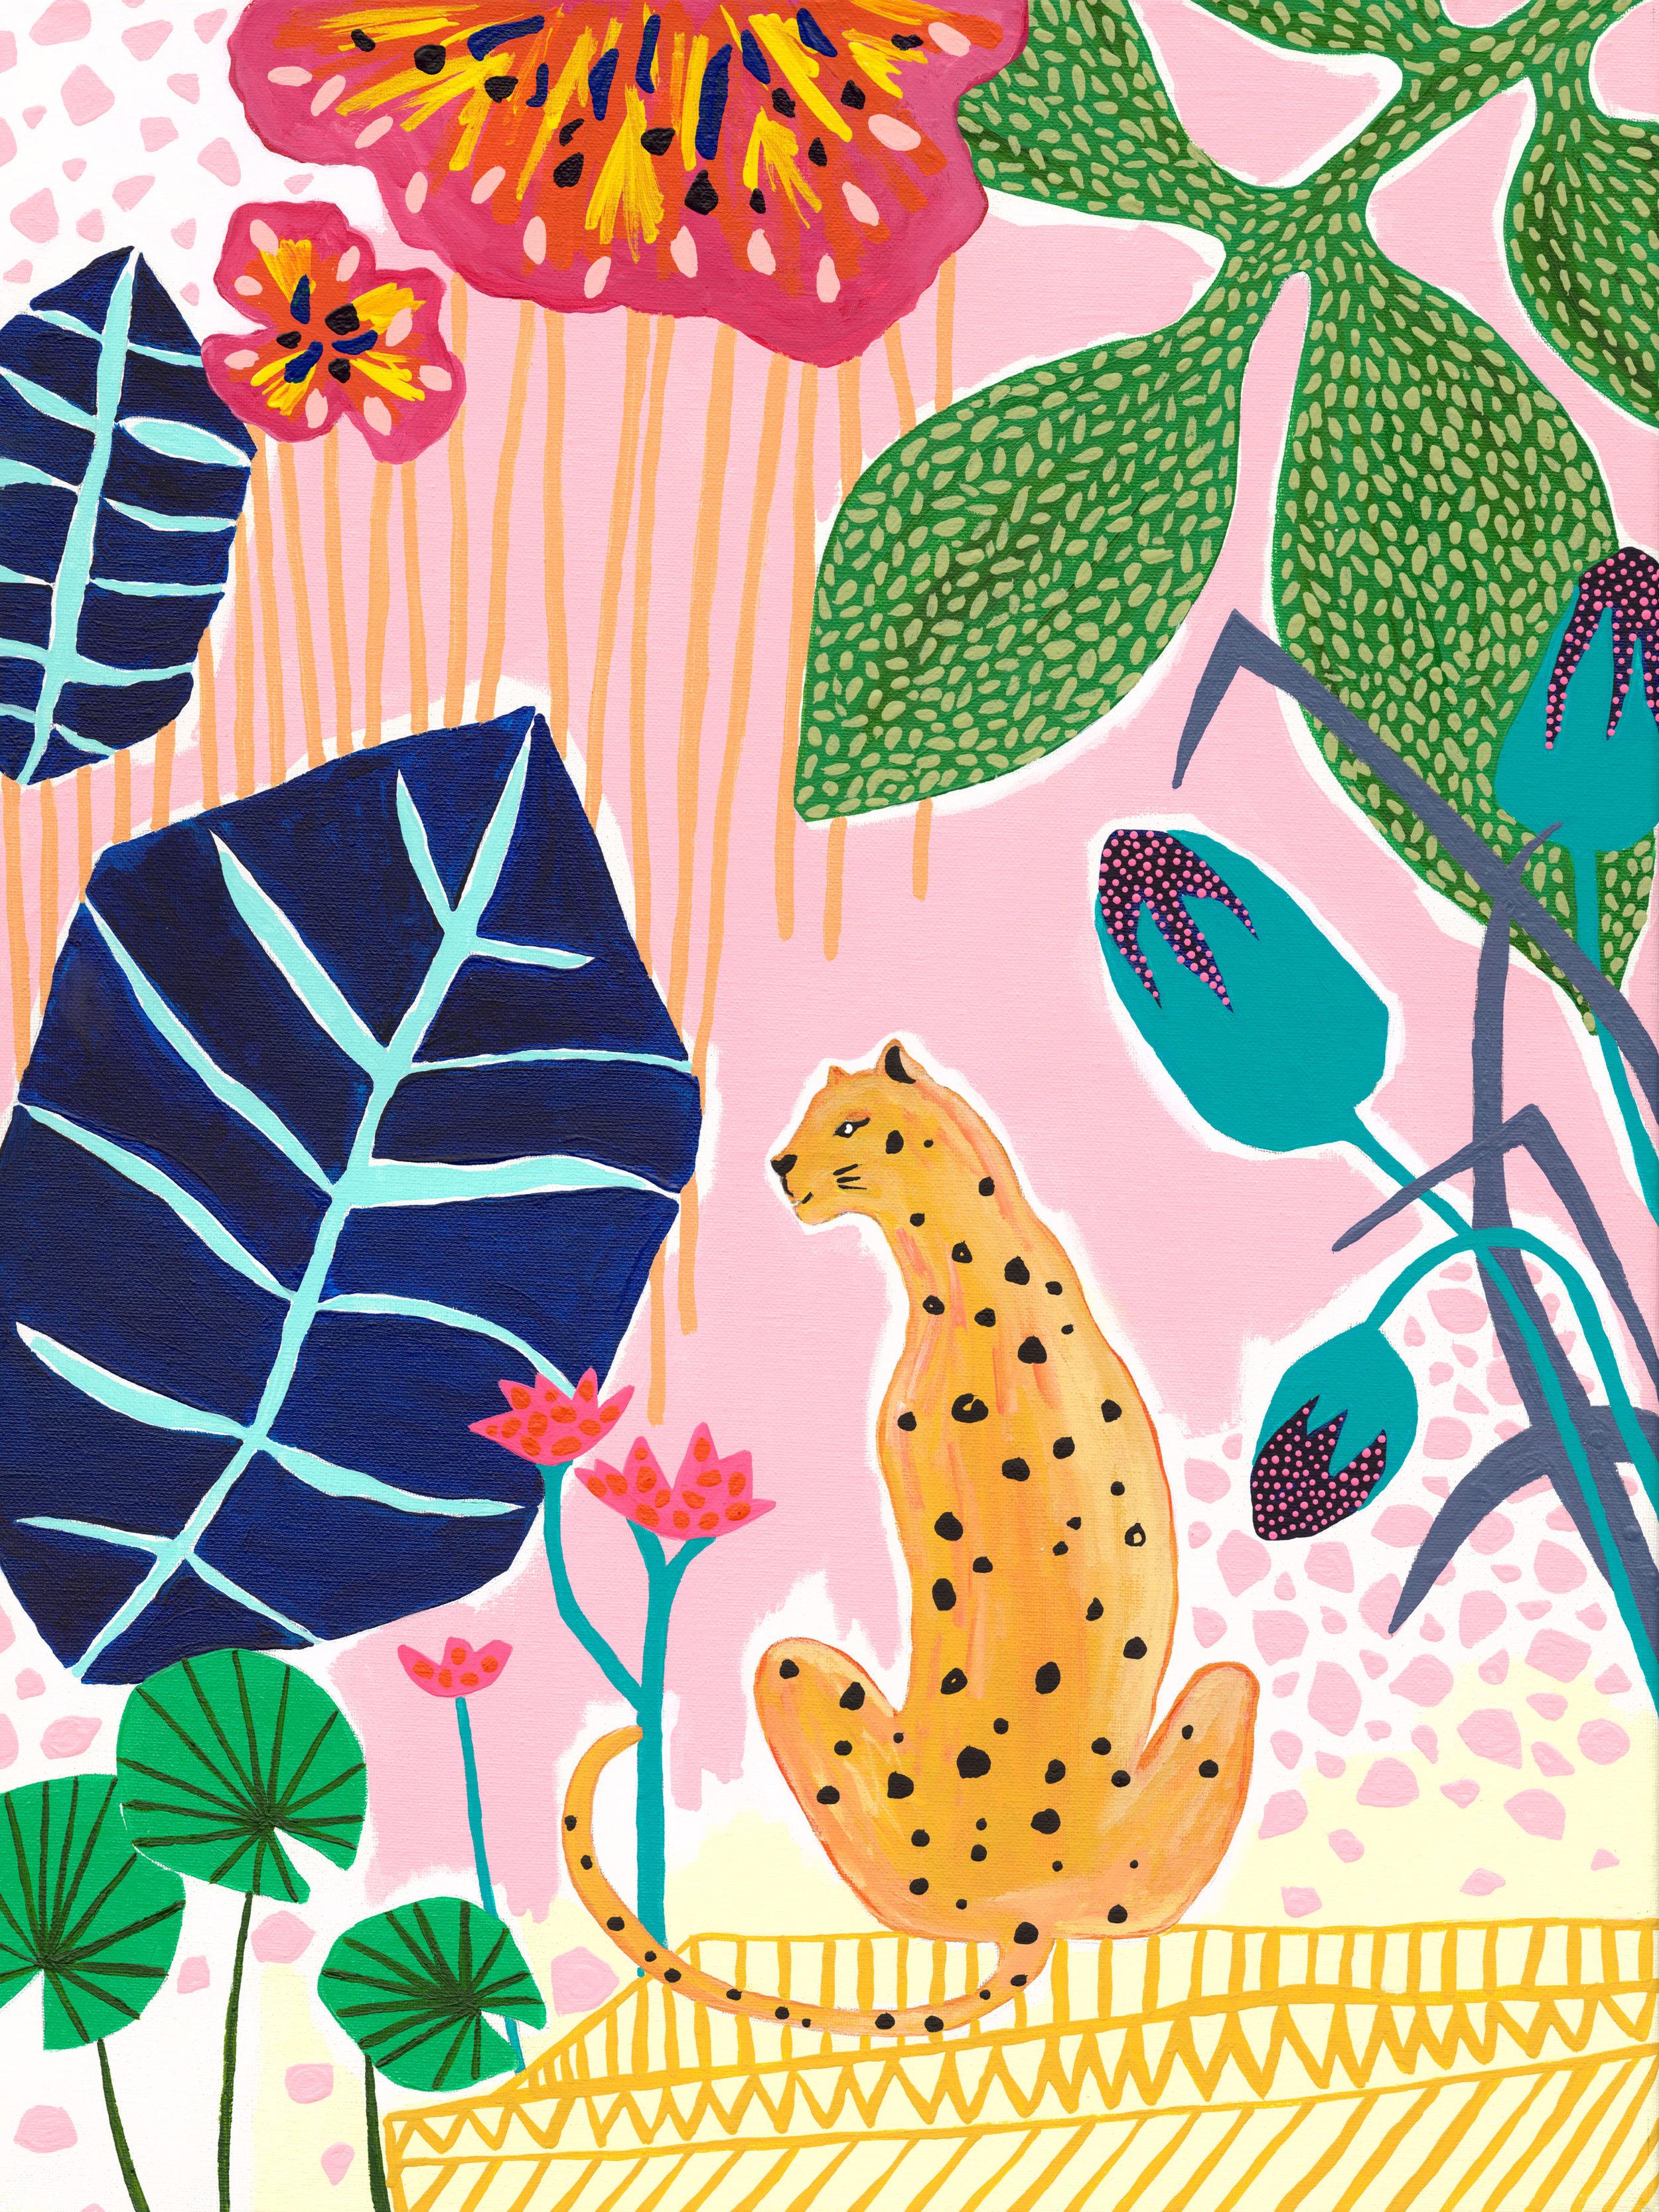 Cheetah_PinkJungle_JenniferMcCully_LowRes.jpg